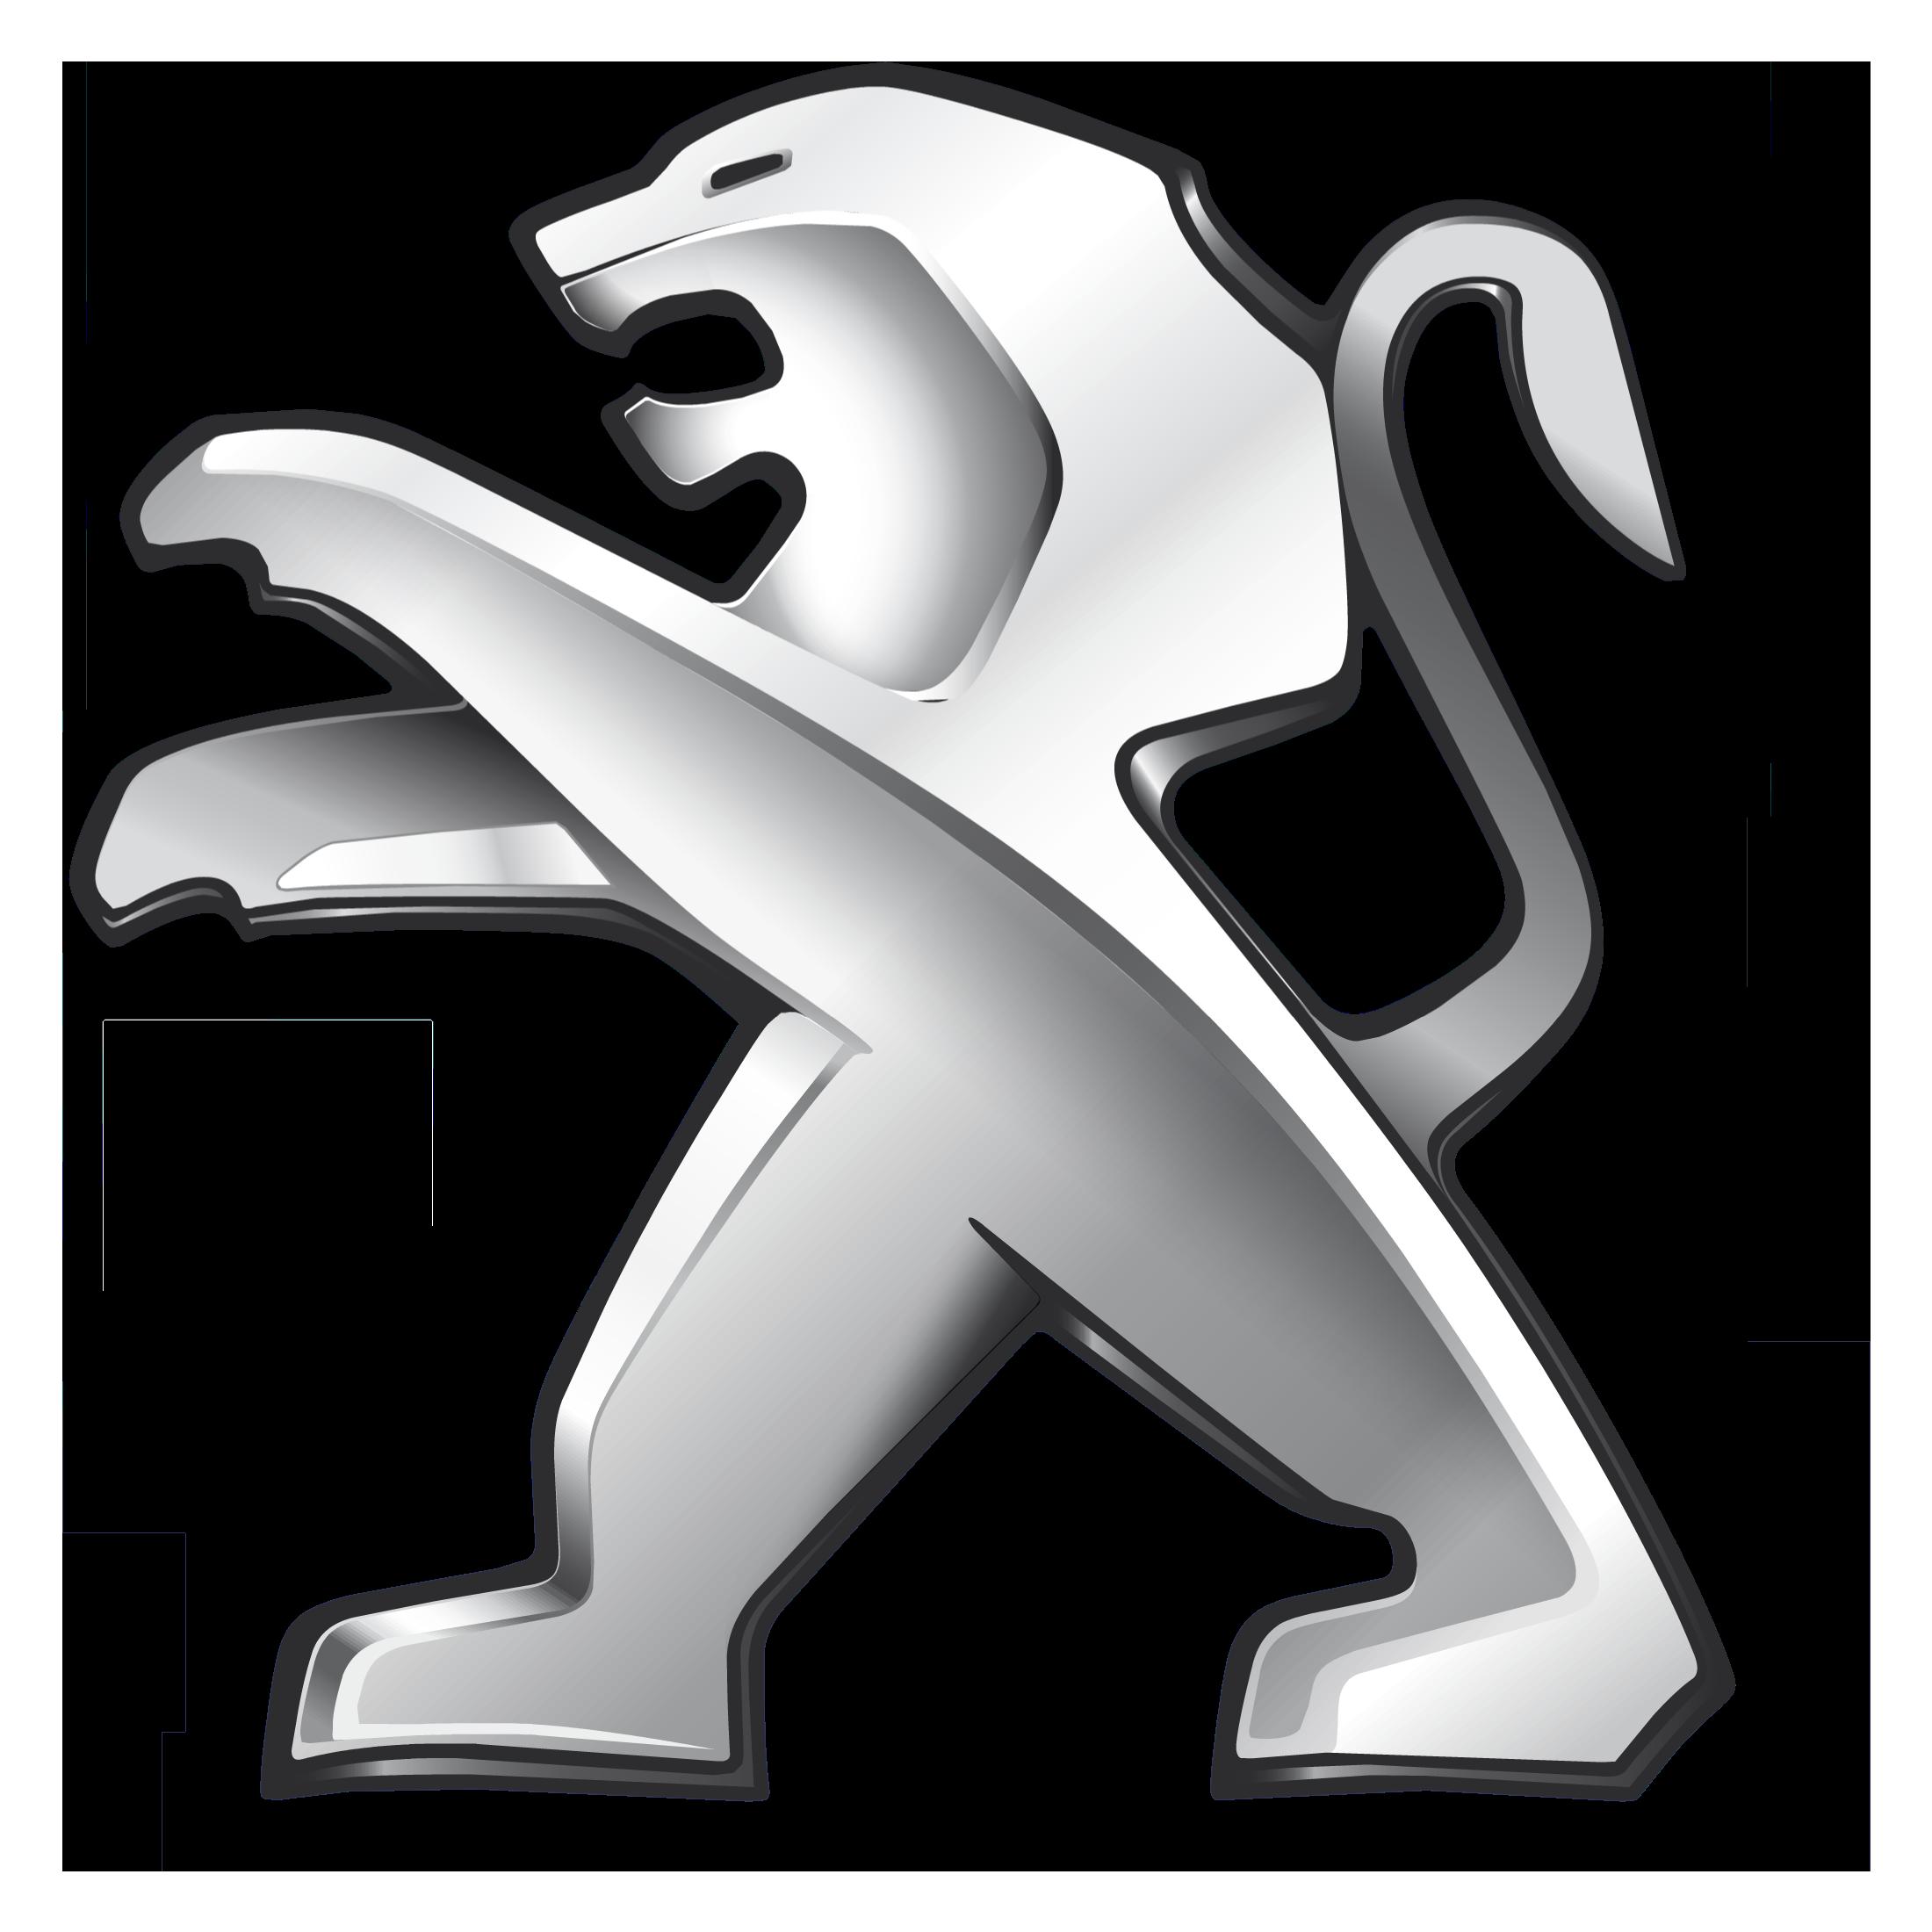 Peugeot Partner ilgalaikė automobilių nuoma | Sixt Leasing